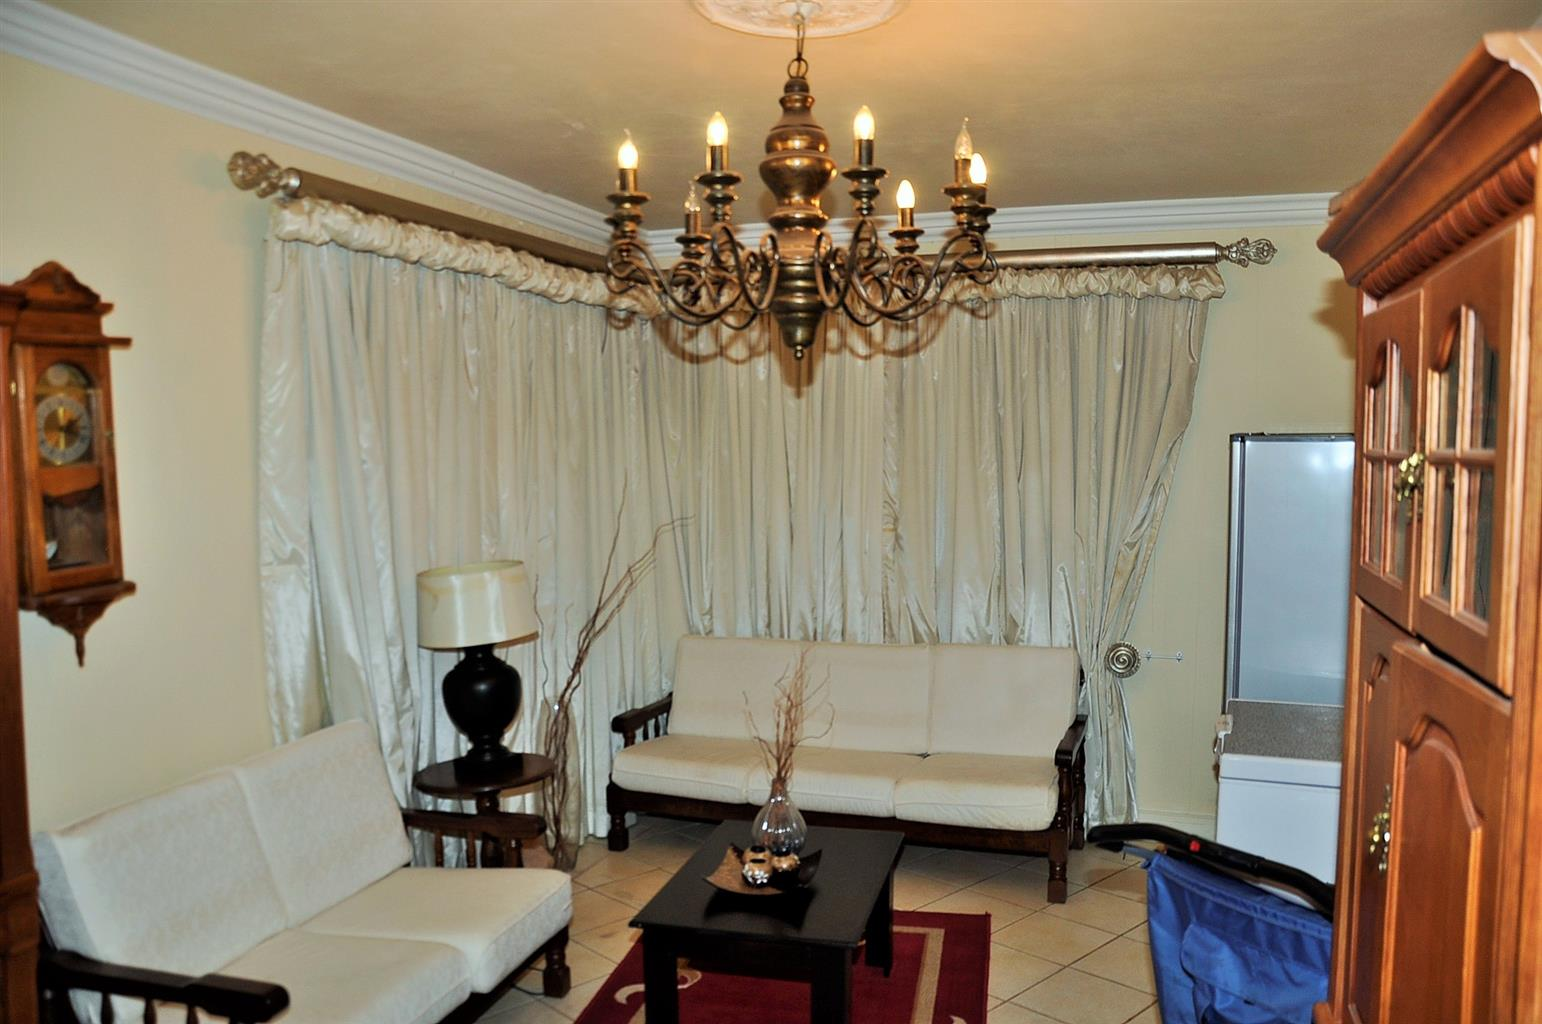 FOR SALE 3-BEDROOM HOUSE IN WOODLANDS LIFESTYLE ESTATE, PRETORIA EAST